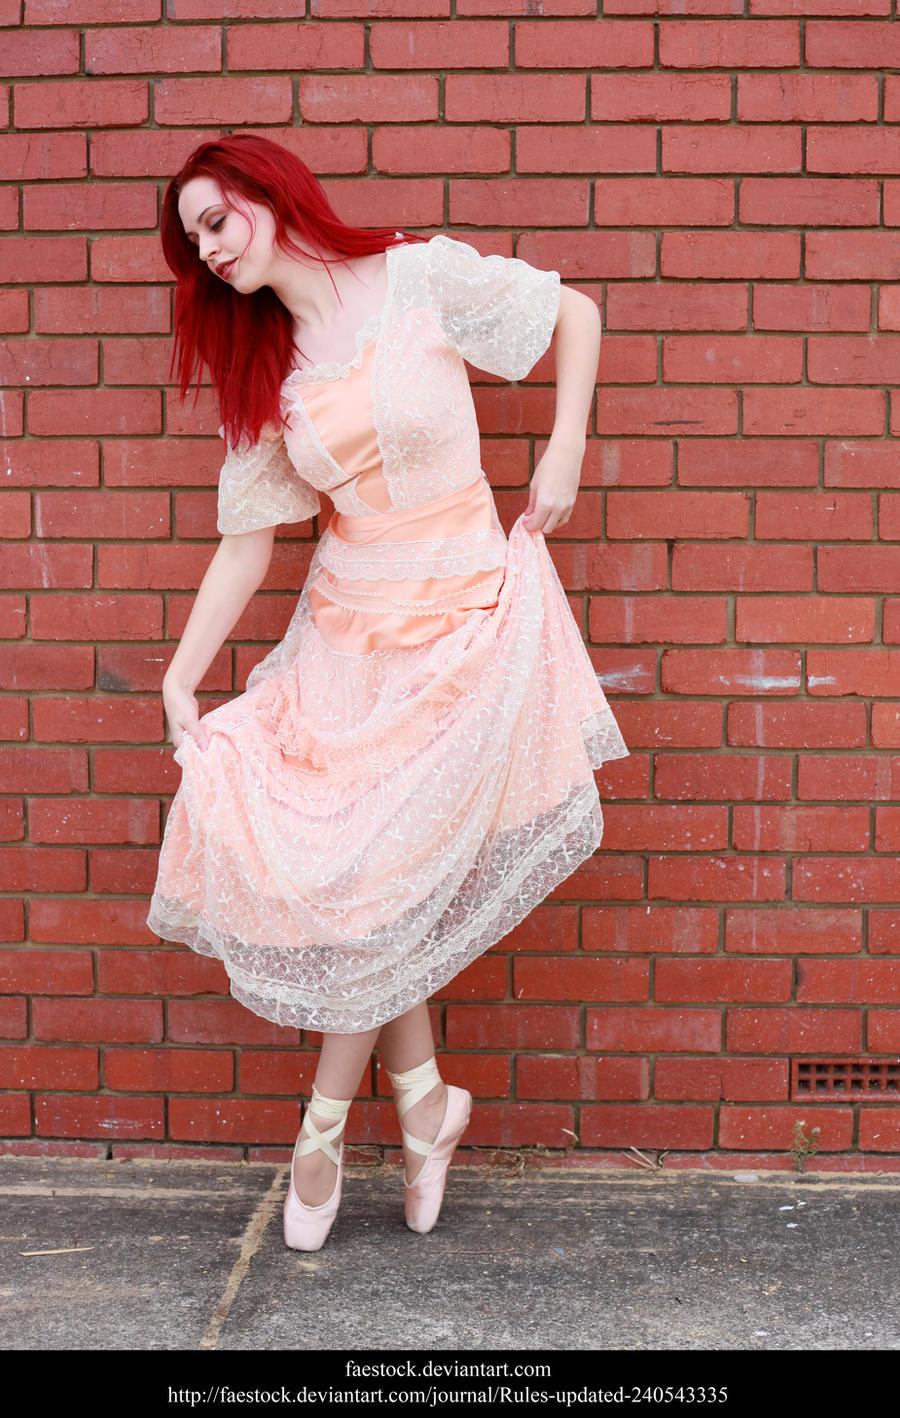 Peach8 by faestock